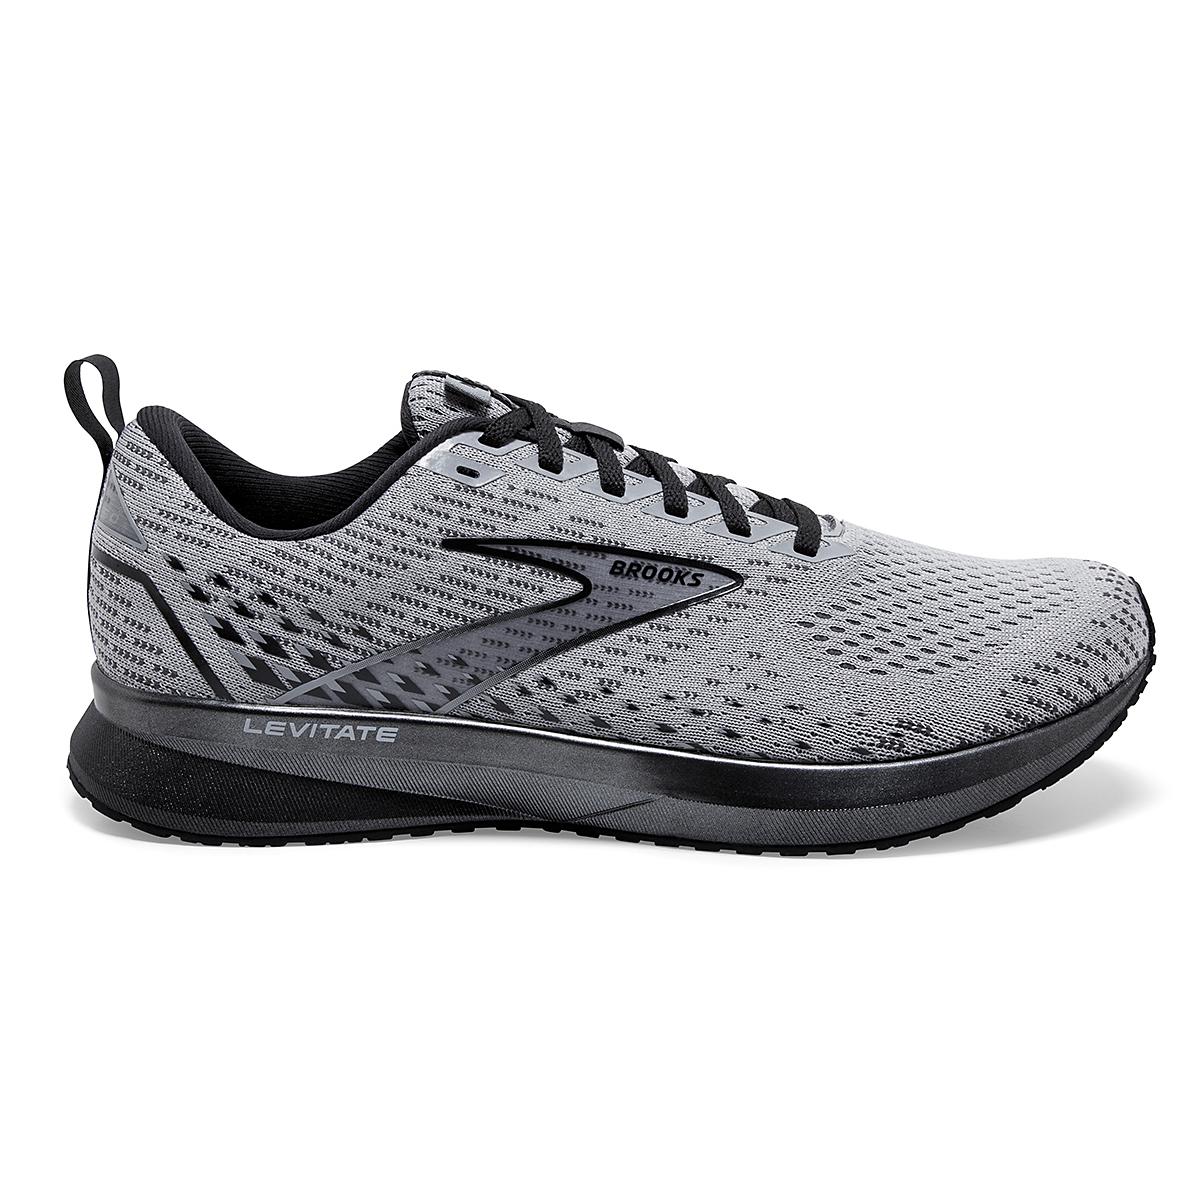 Men's Brooks Levitate 5 Running Shoe - Color: Grey/Blackened - Size: 7 - Width: Regular, Grey/Blackened, large, image 1